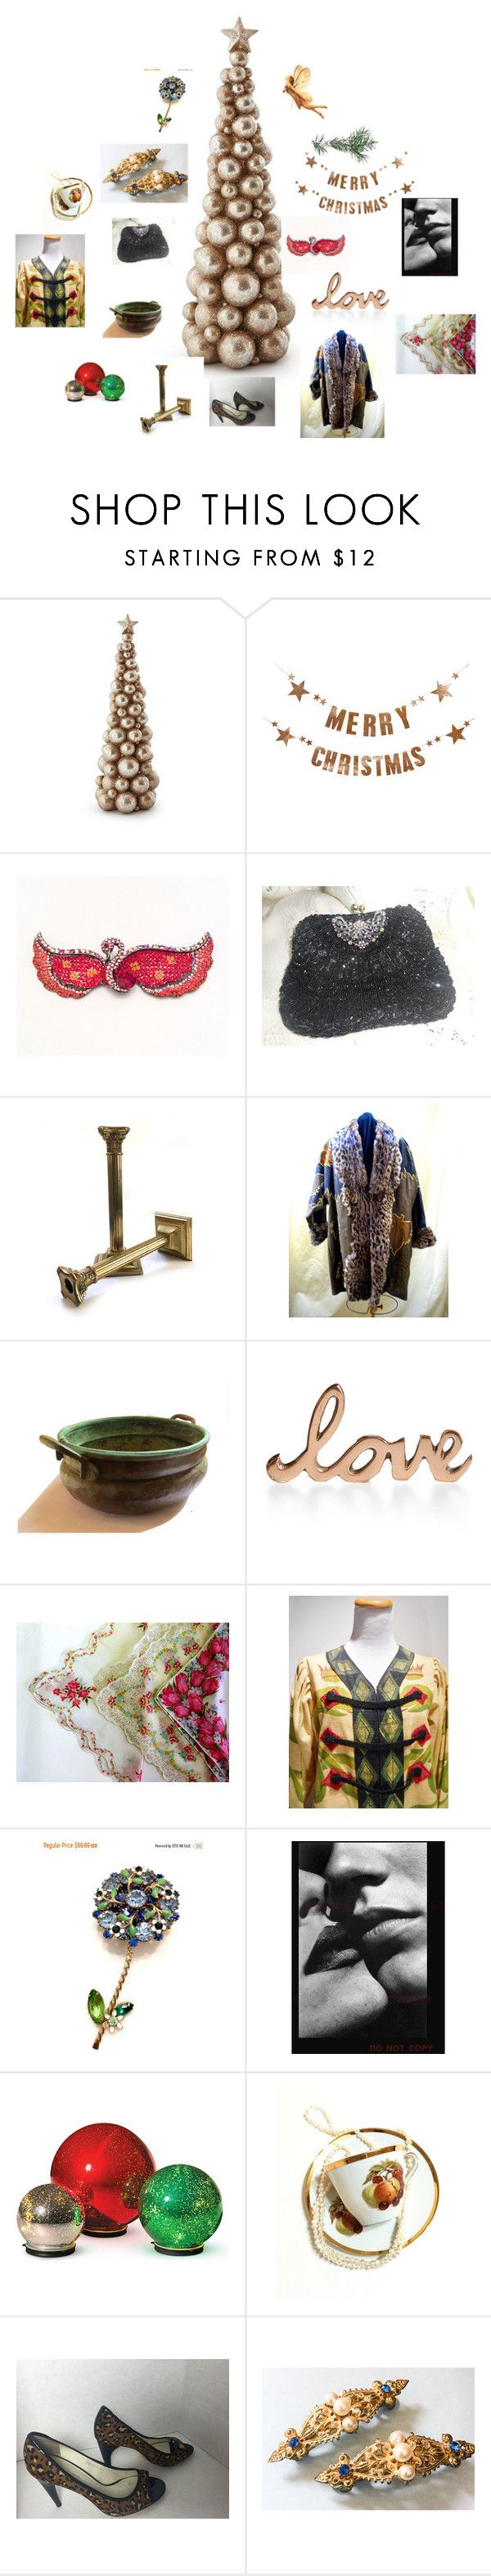 Best 25+ Wilson home improvement ideas on Pinterest | Wine racks ...